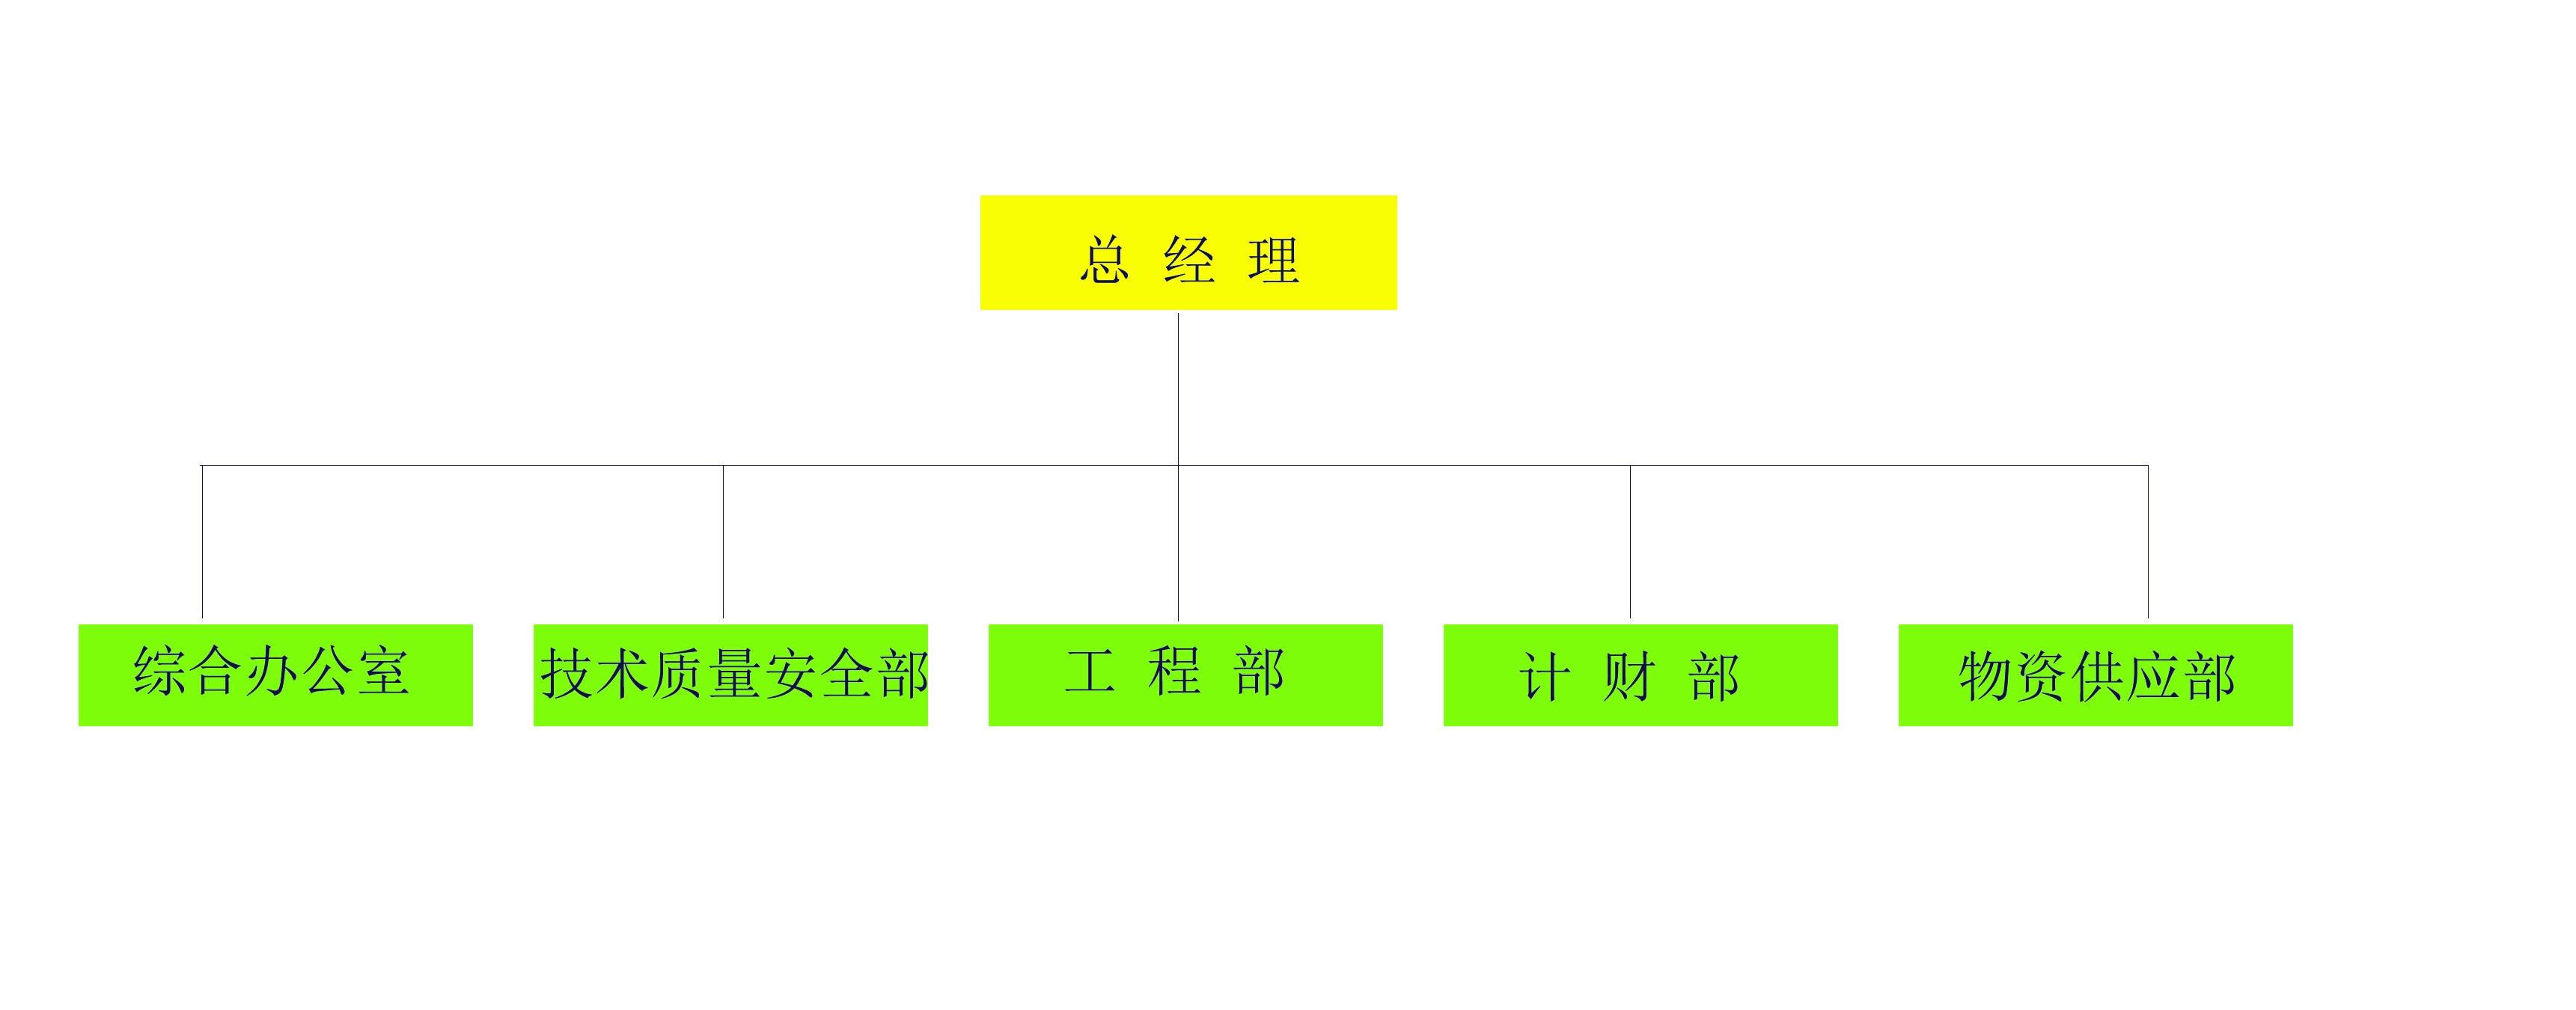 webwxgetmsgimg (4.jpg